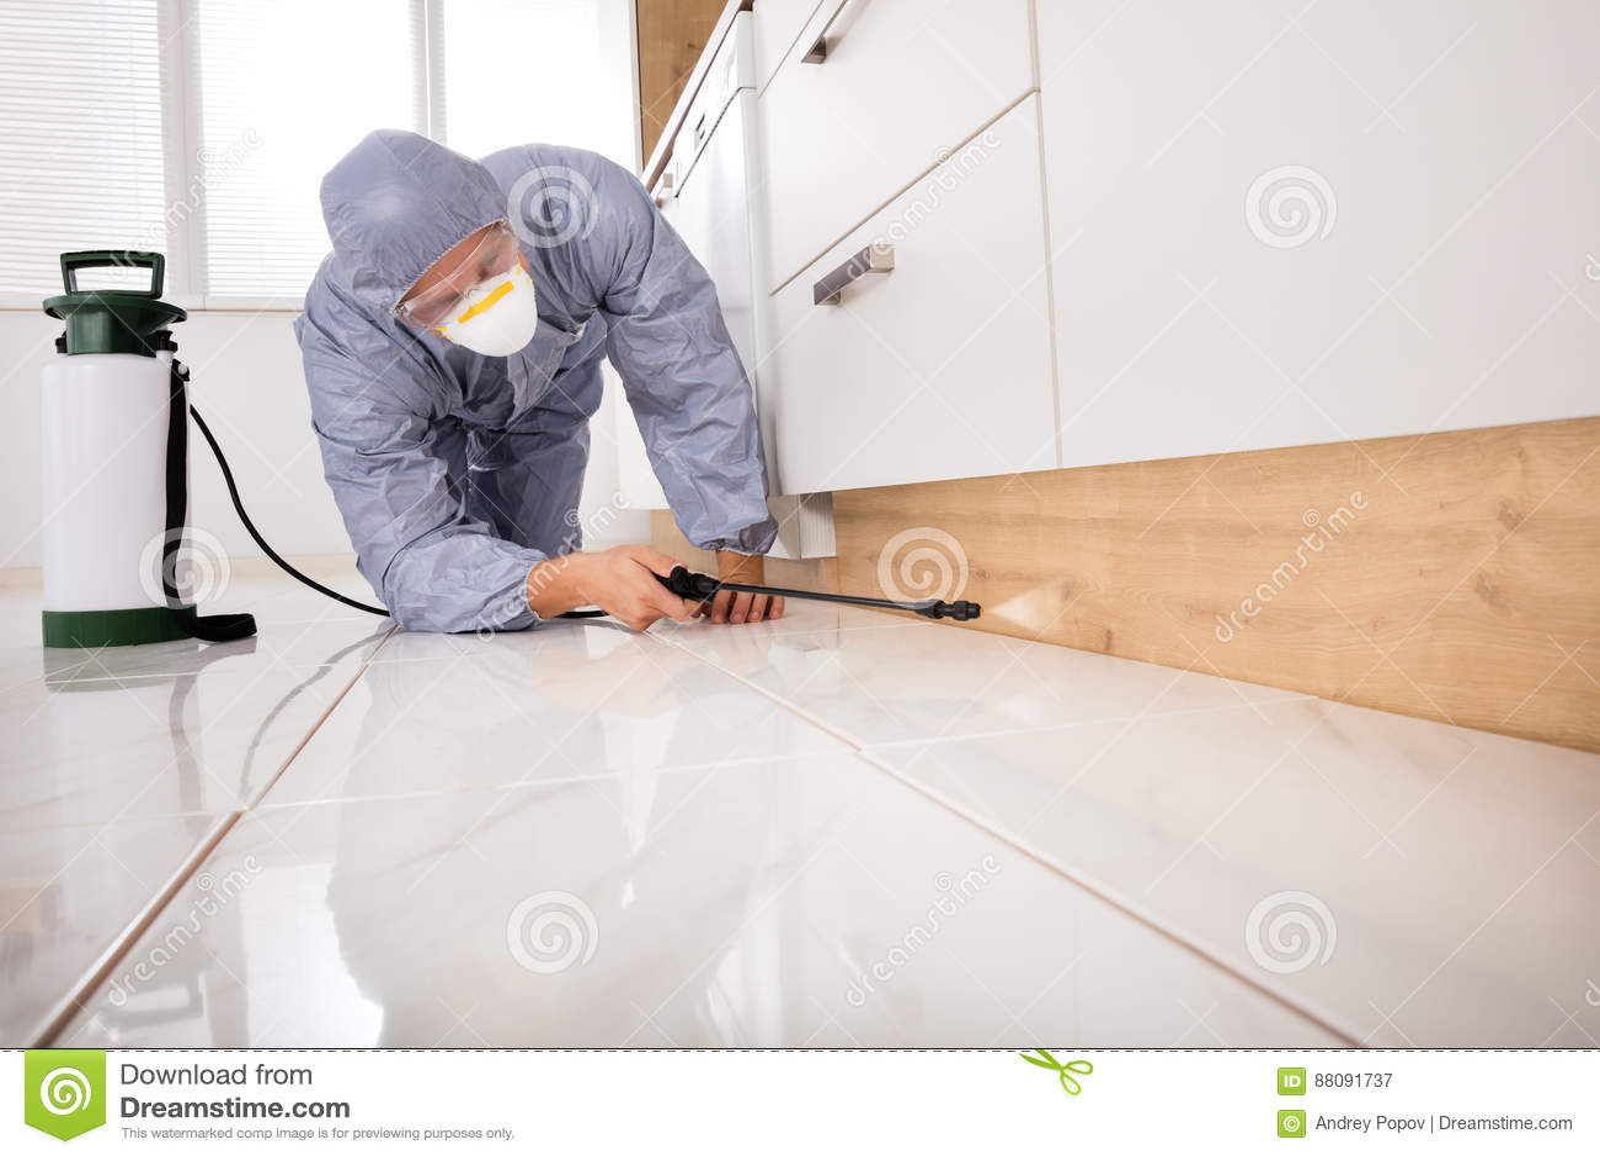 kitchen side sprayer software 驱除剂喷洒的杀虫剂在厨房里库存图片 图片包括有防护 成人 藏品 工作 驱除剂喷洒的杀虫剂在厨房里